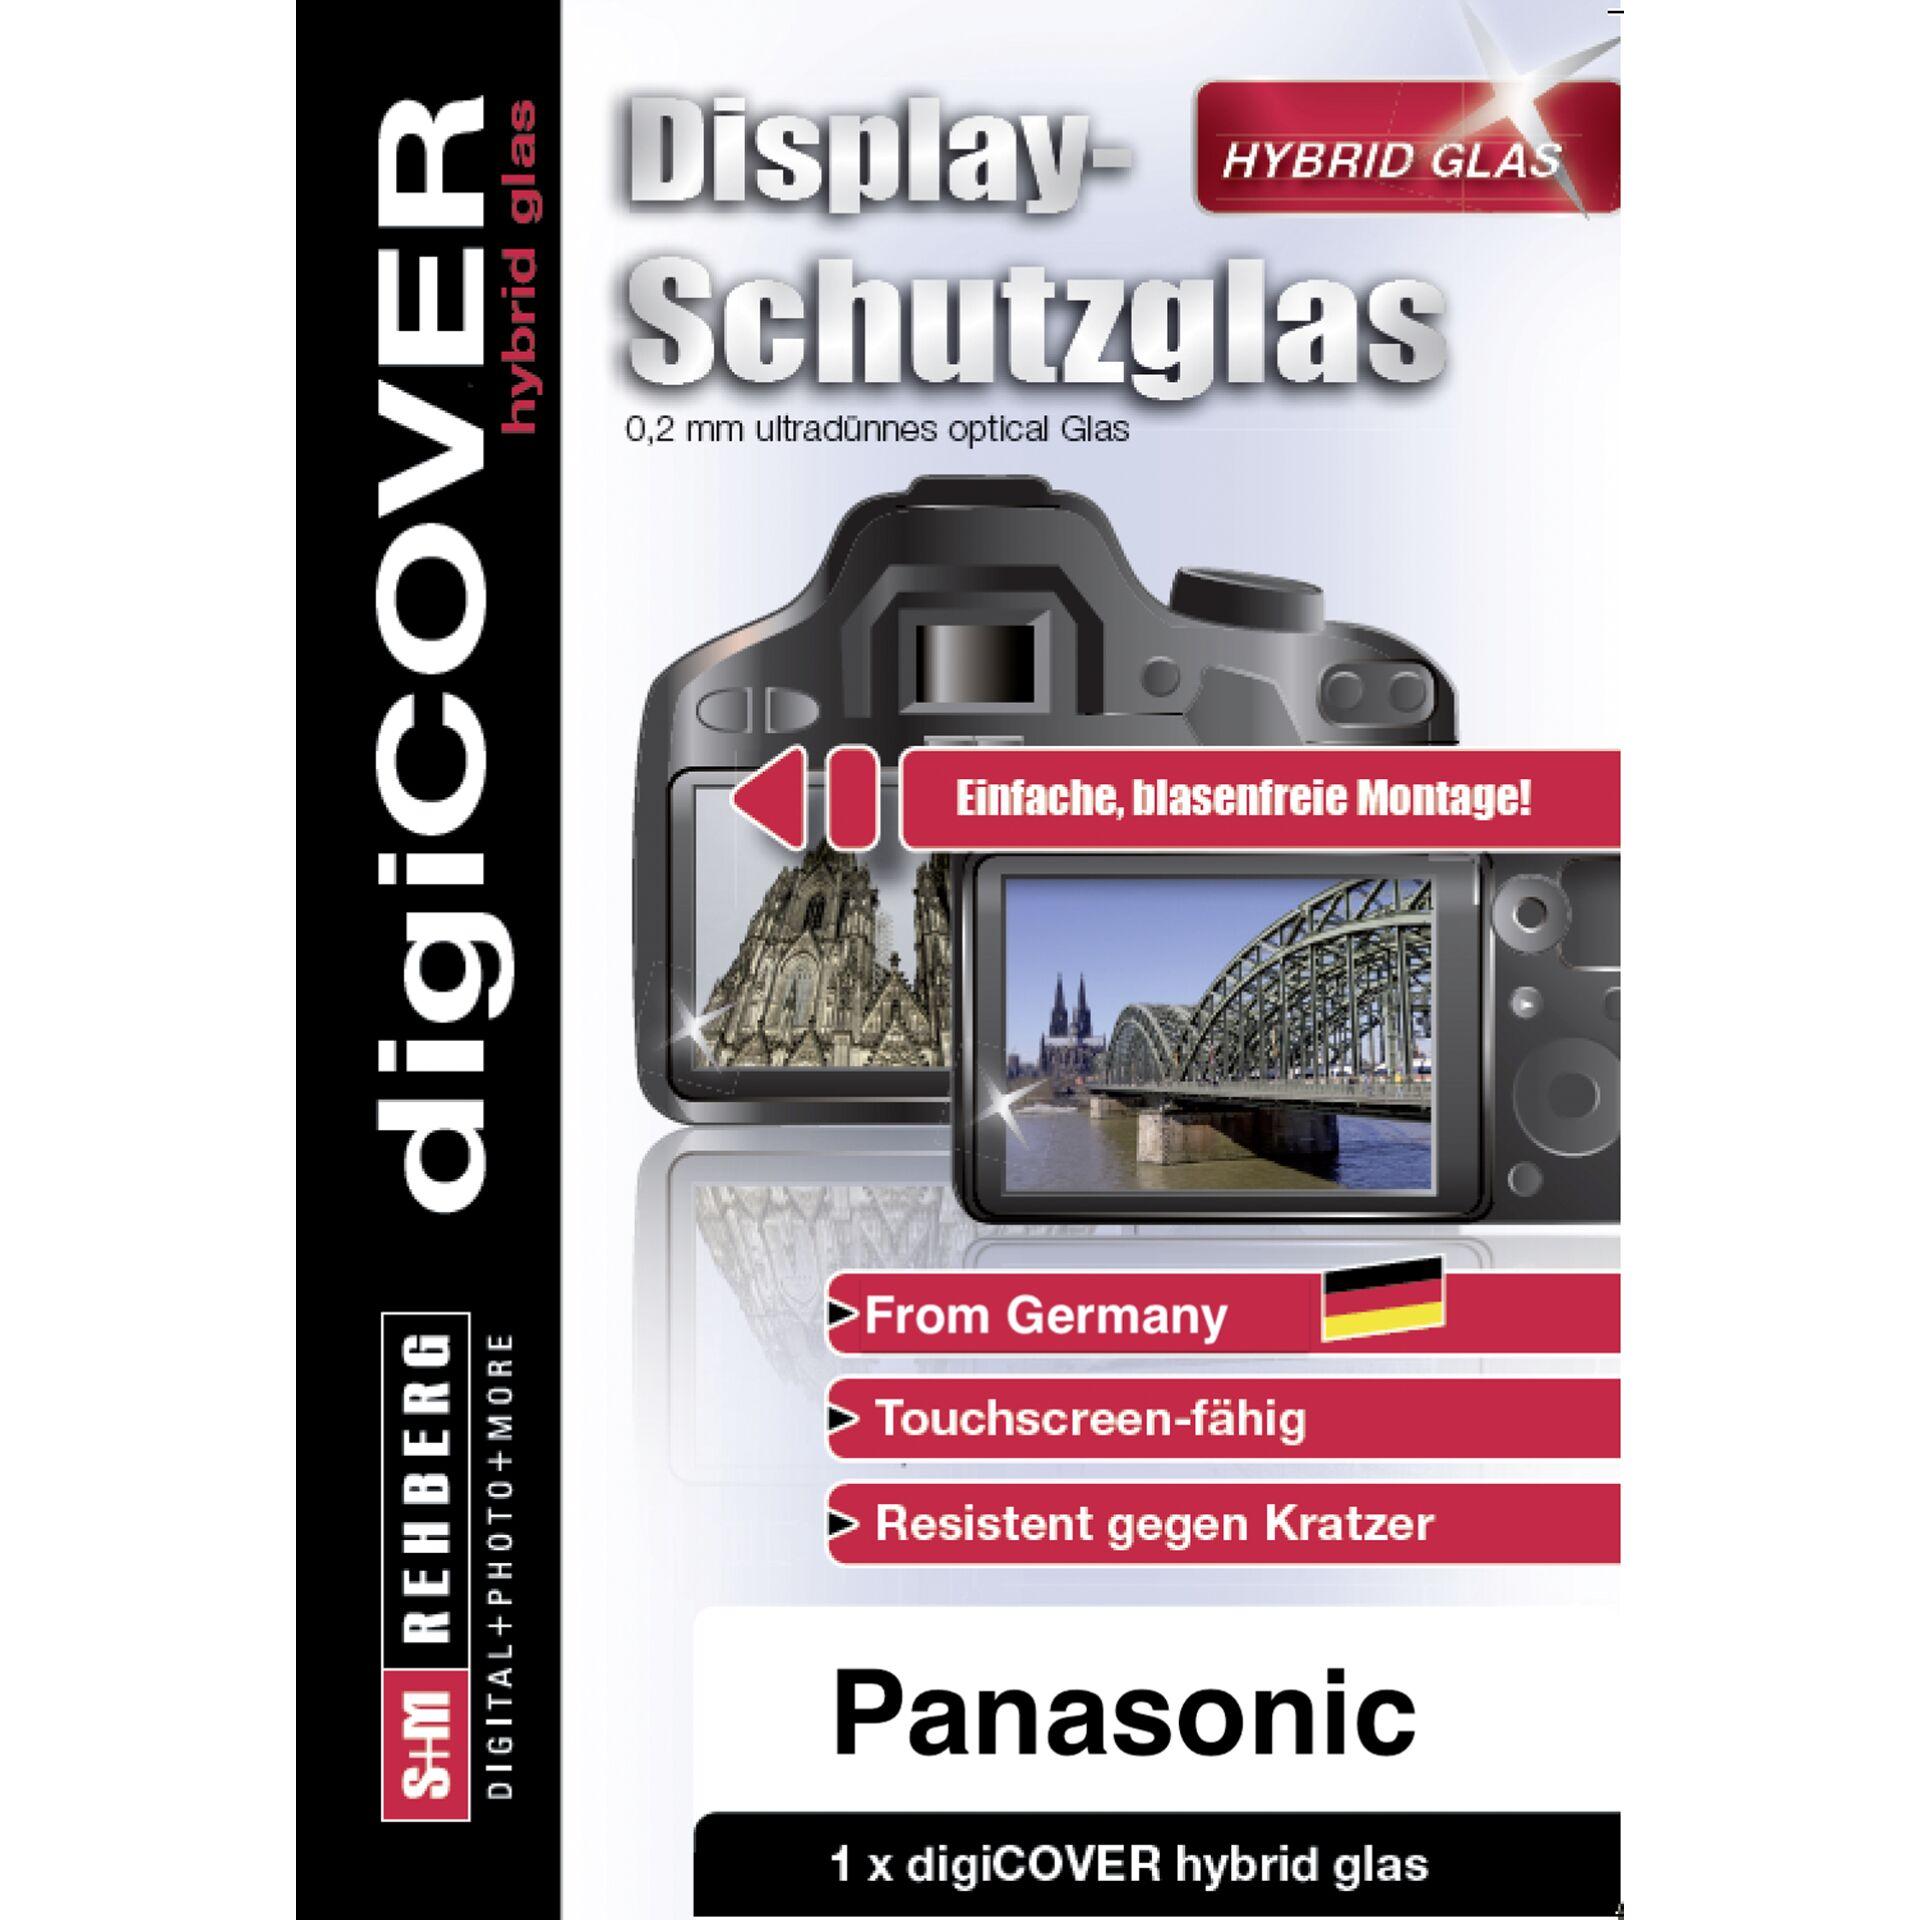 DigiCOVER Hybrid Glass Display Cover Panasonic S5